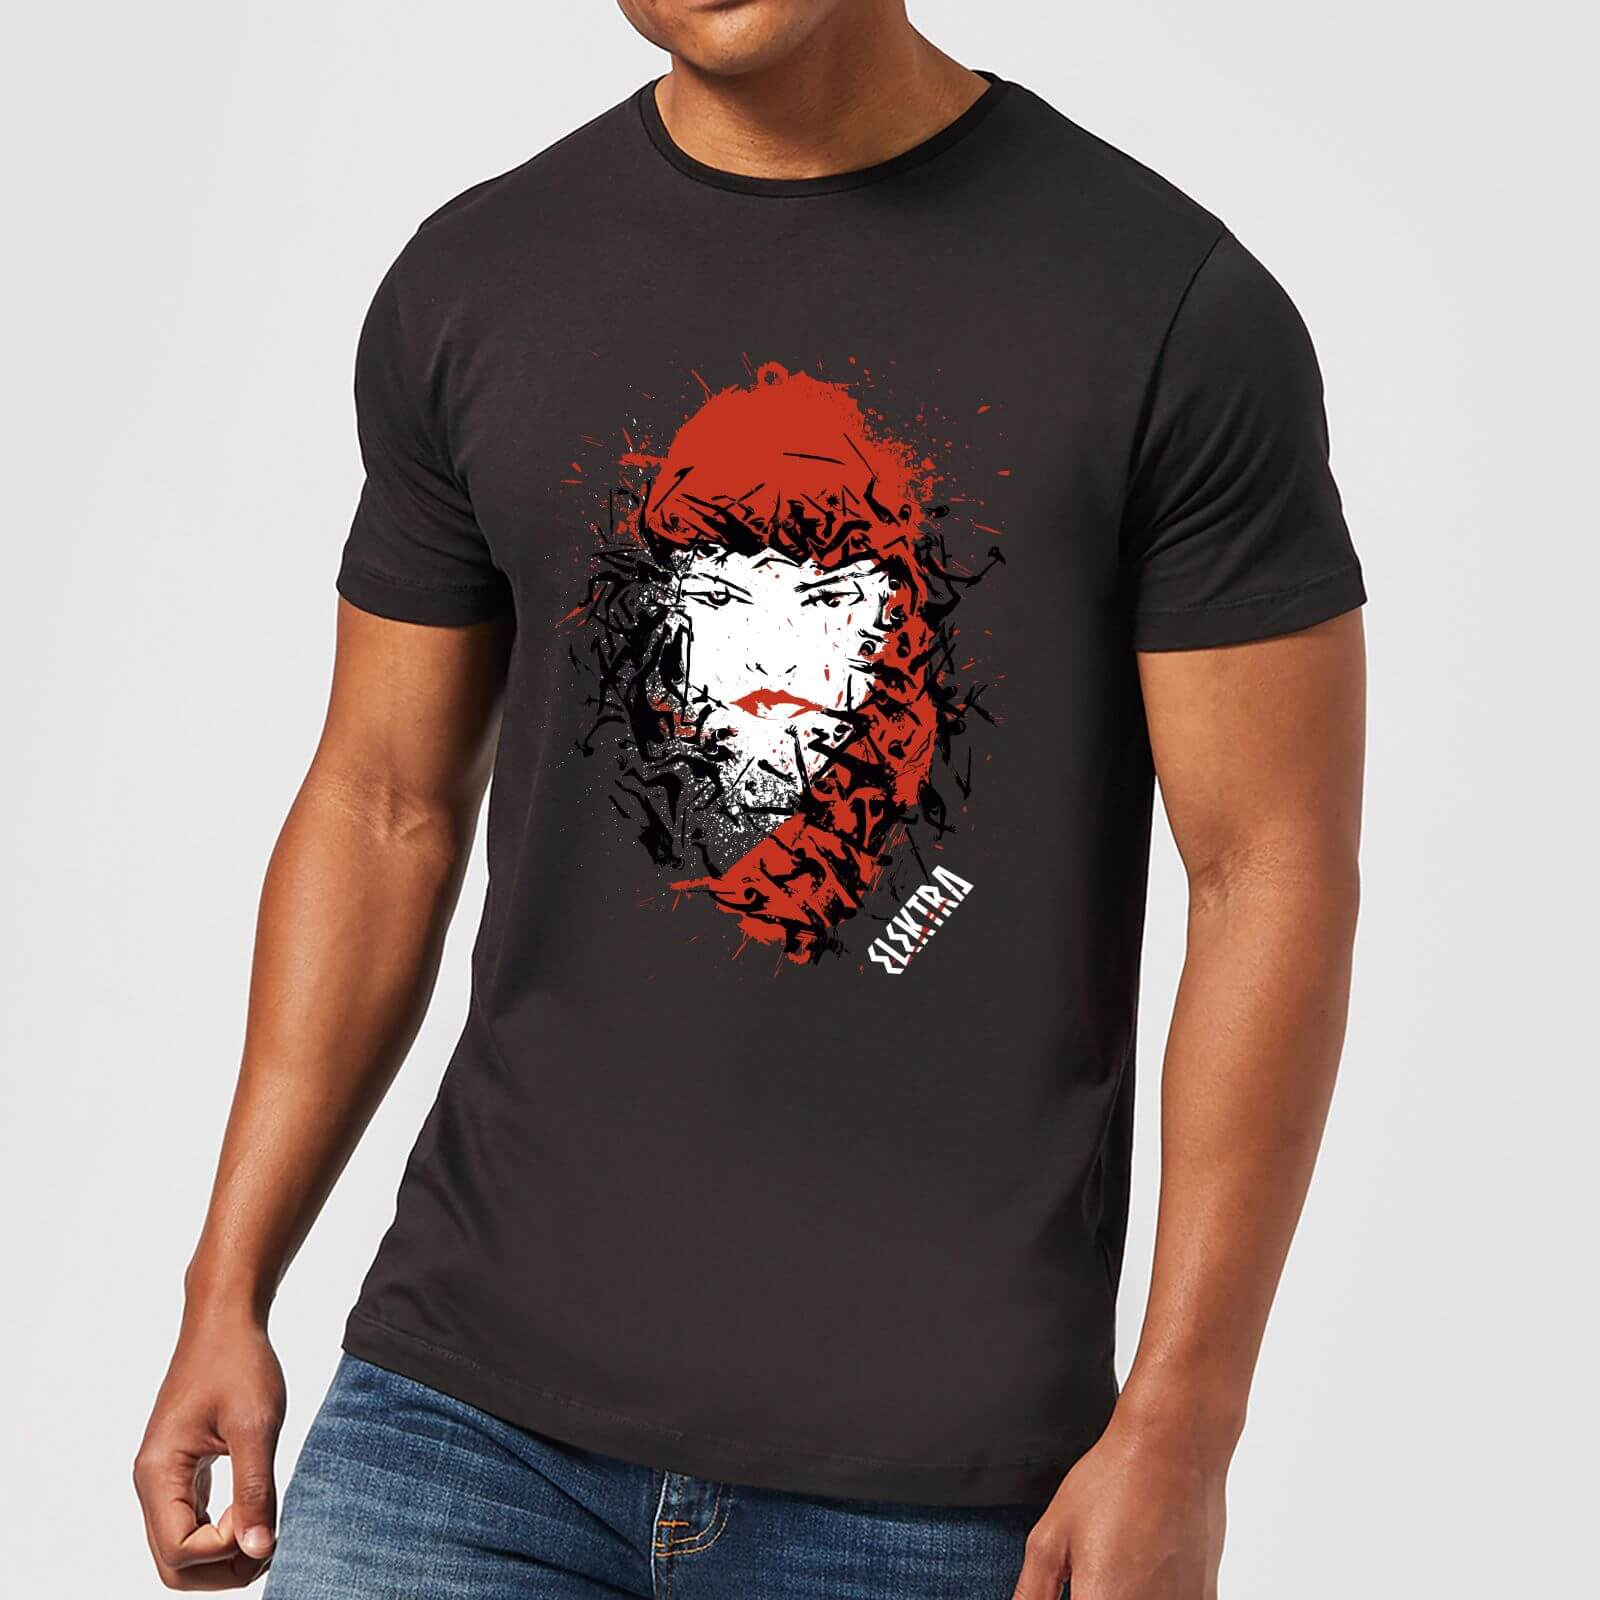 OfferteWeb.click 31-t-shirt-marvel-knights-elektra-face-of-death-nero-uomo